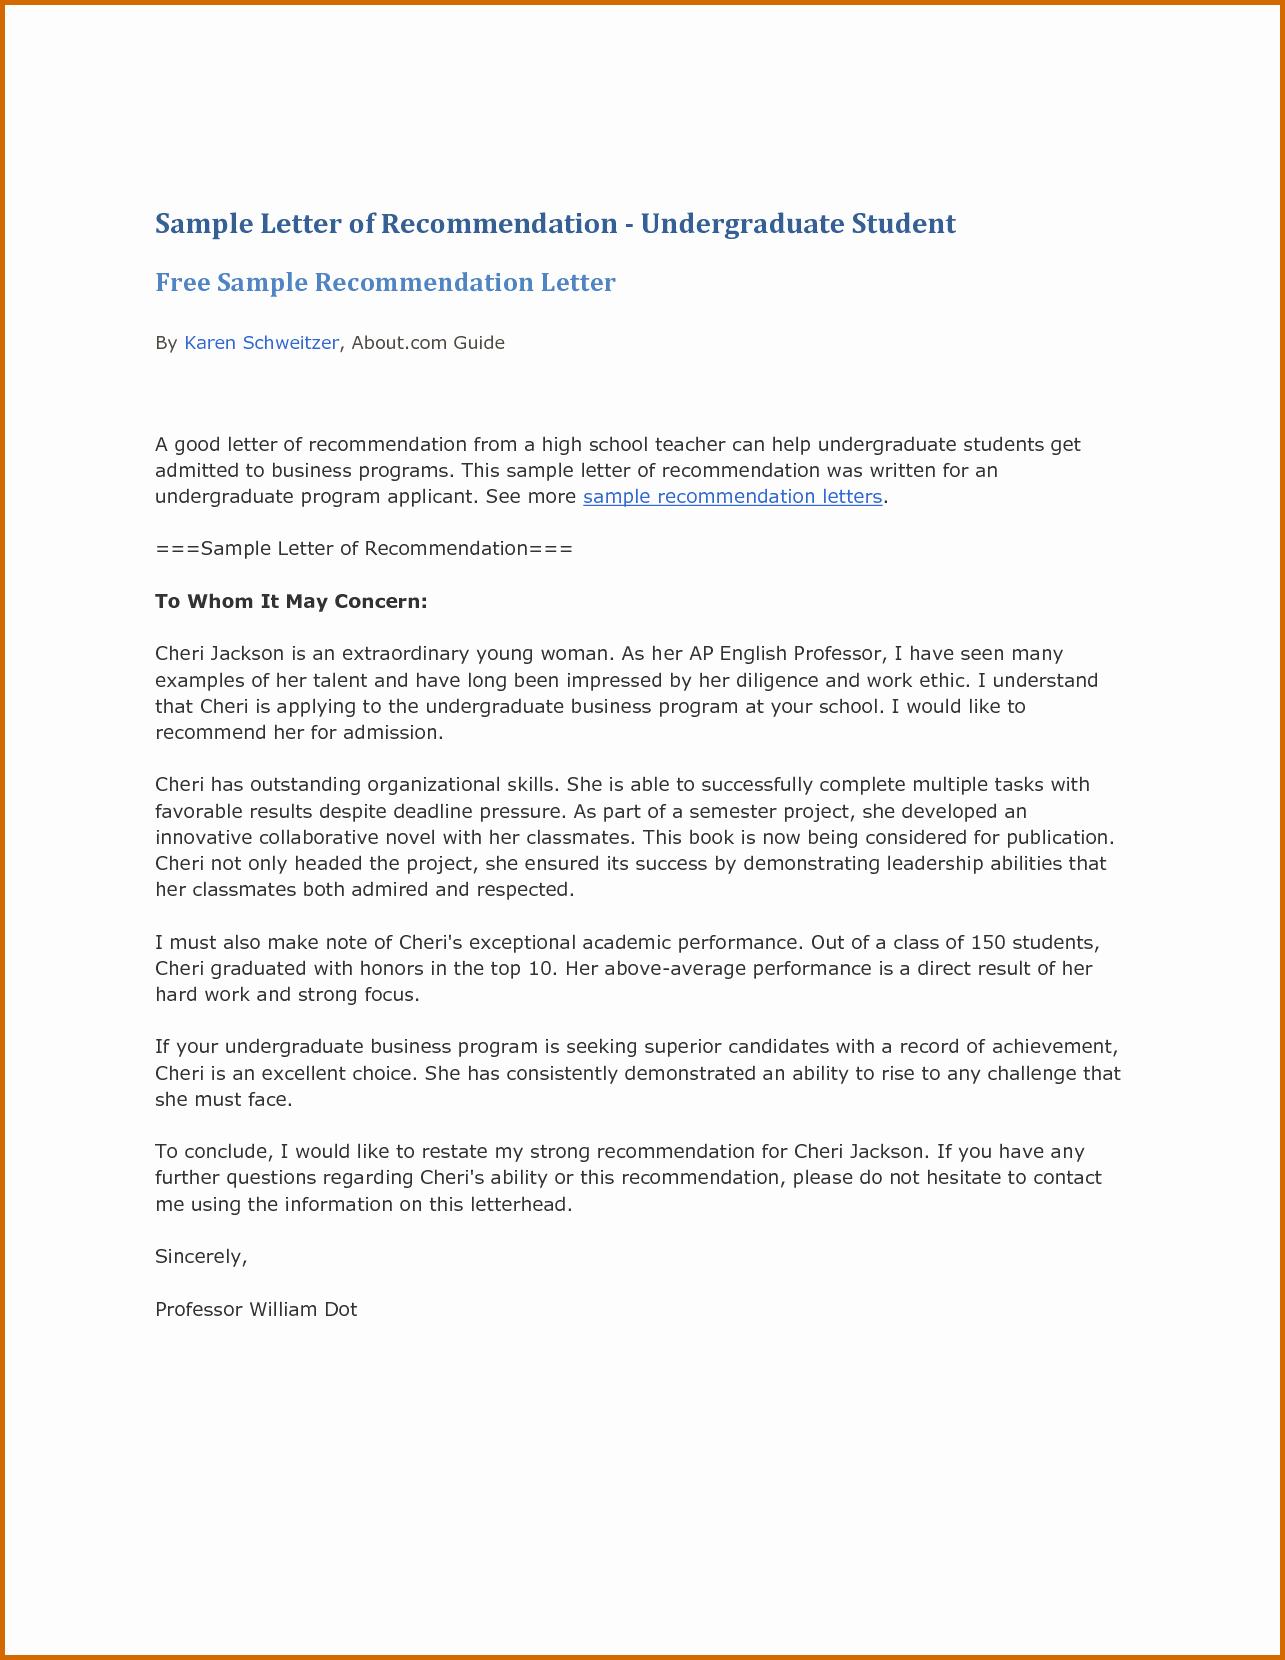 Letters Of Recommendation format Samples Fresh 13 Re Mendation Letter for Student Sample